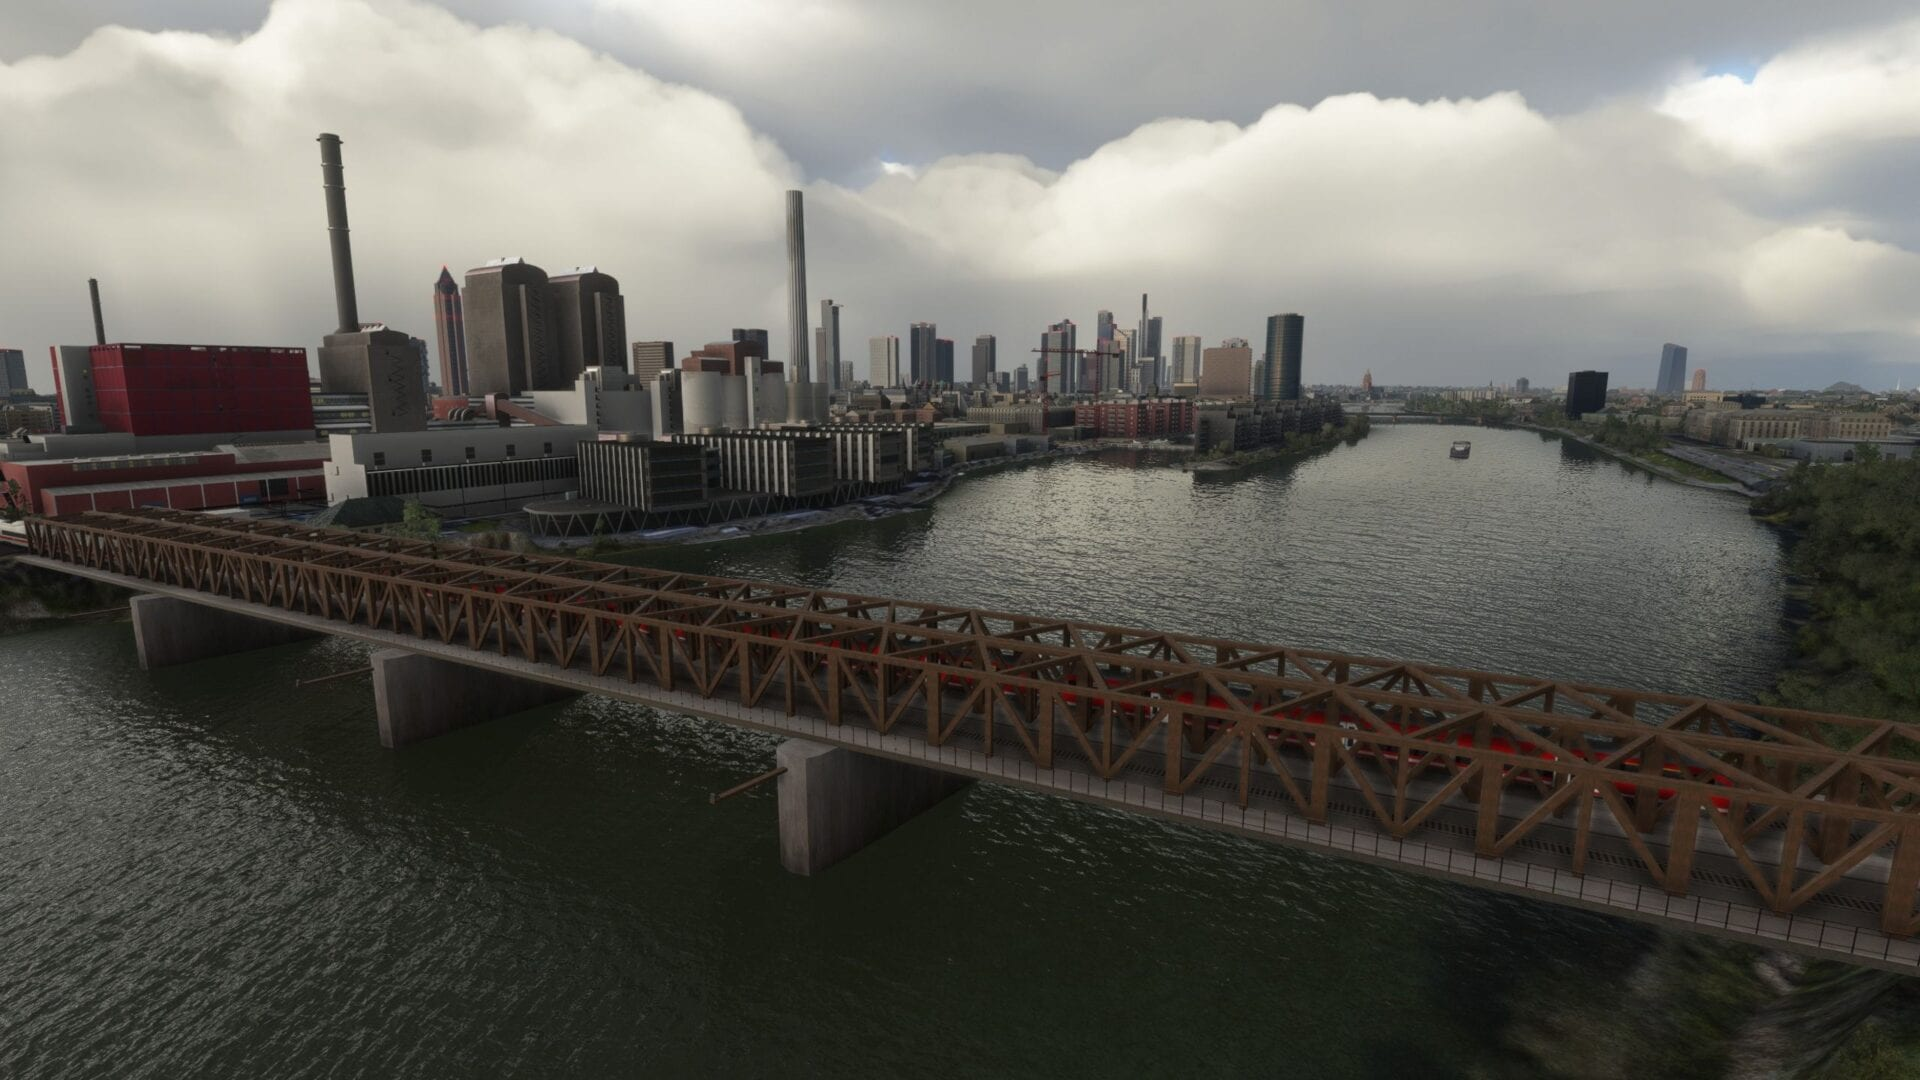 Frankfurt City Pack for Microsoft Flight Simulator Critic Review